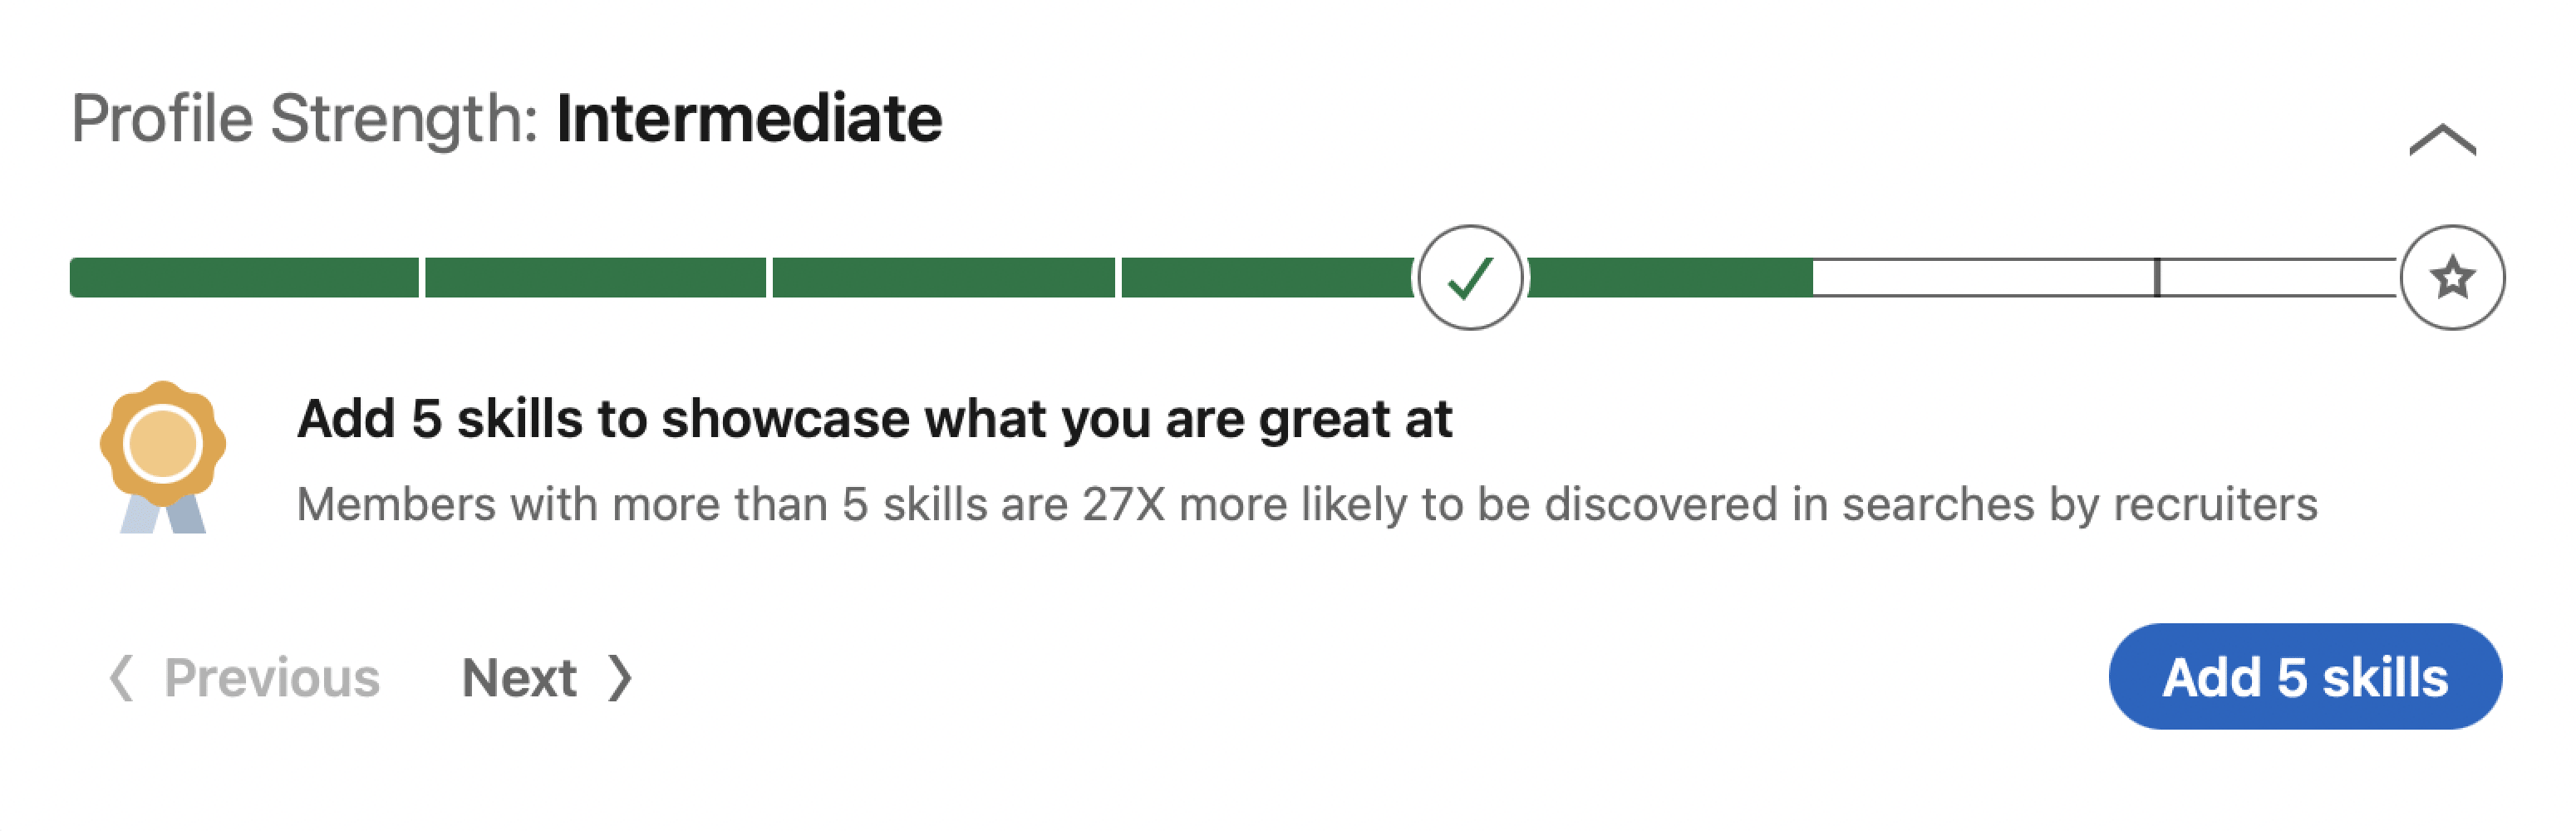 Profile progress bar in LinkedIn